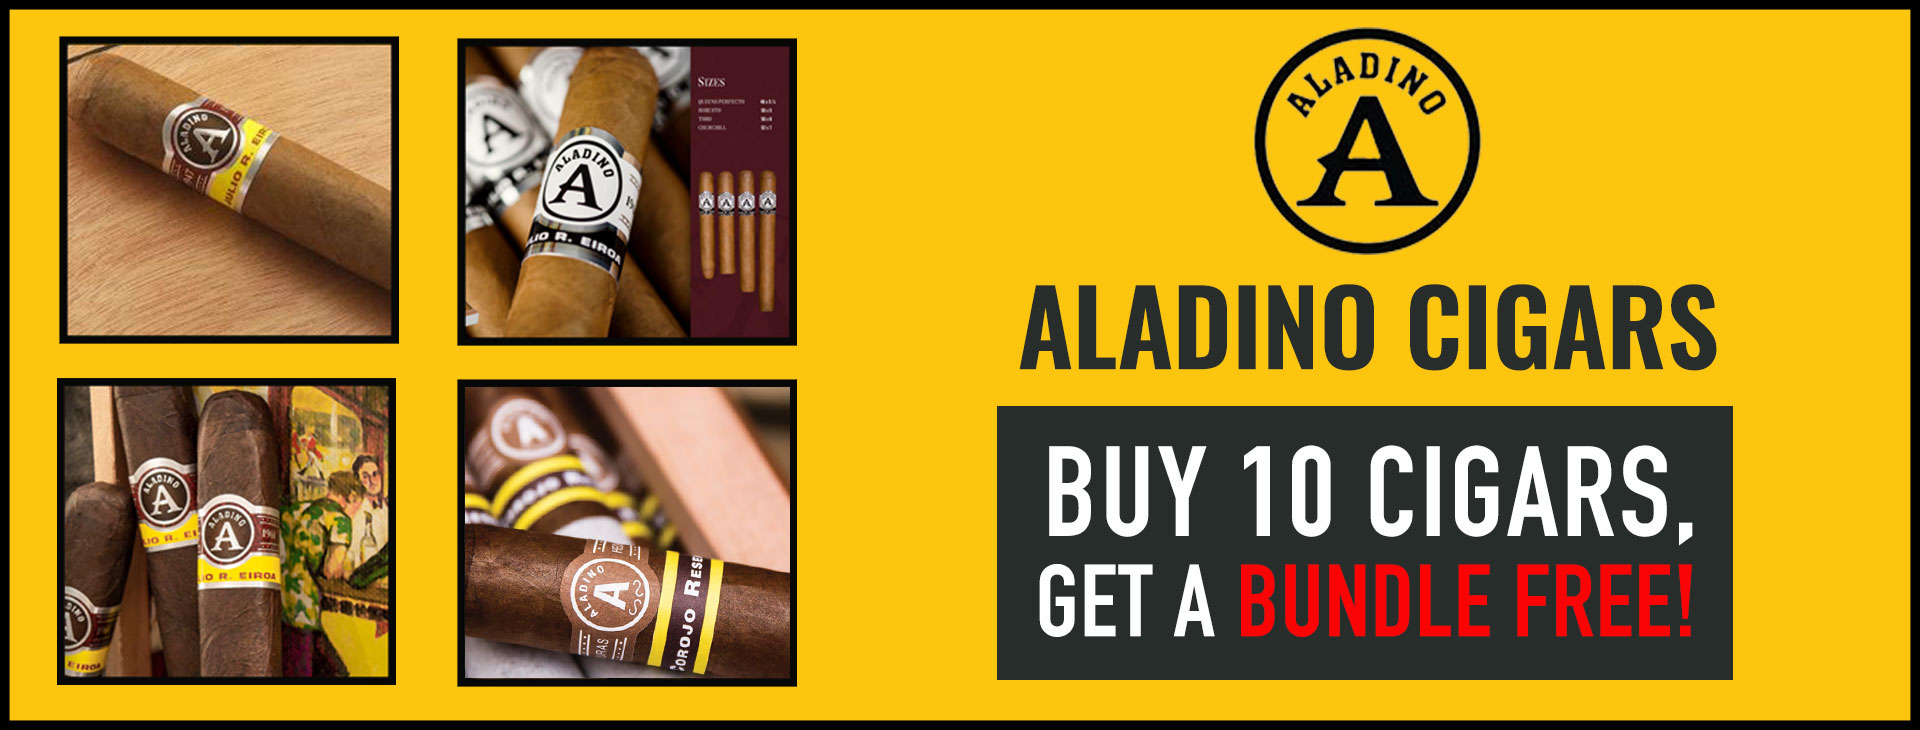 aladino-buy-10-2020-banner.jpg